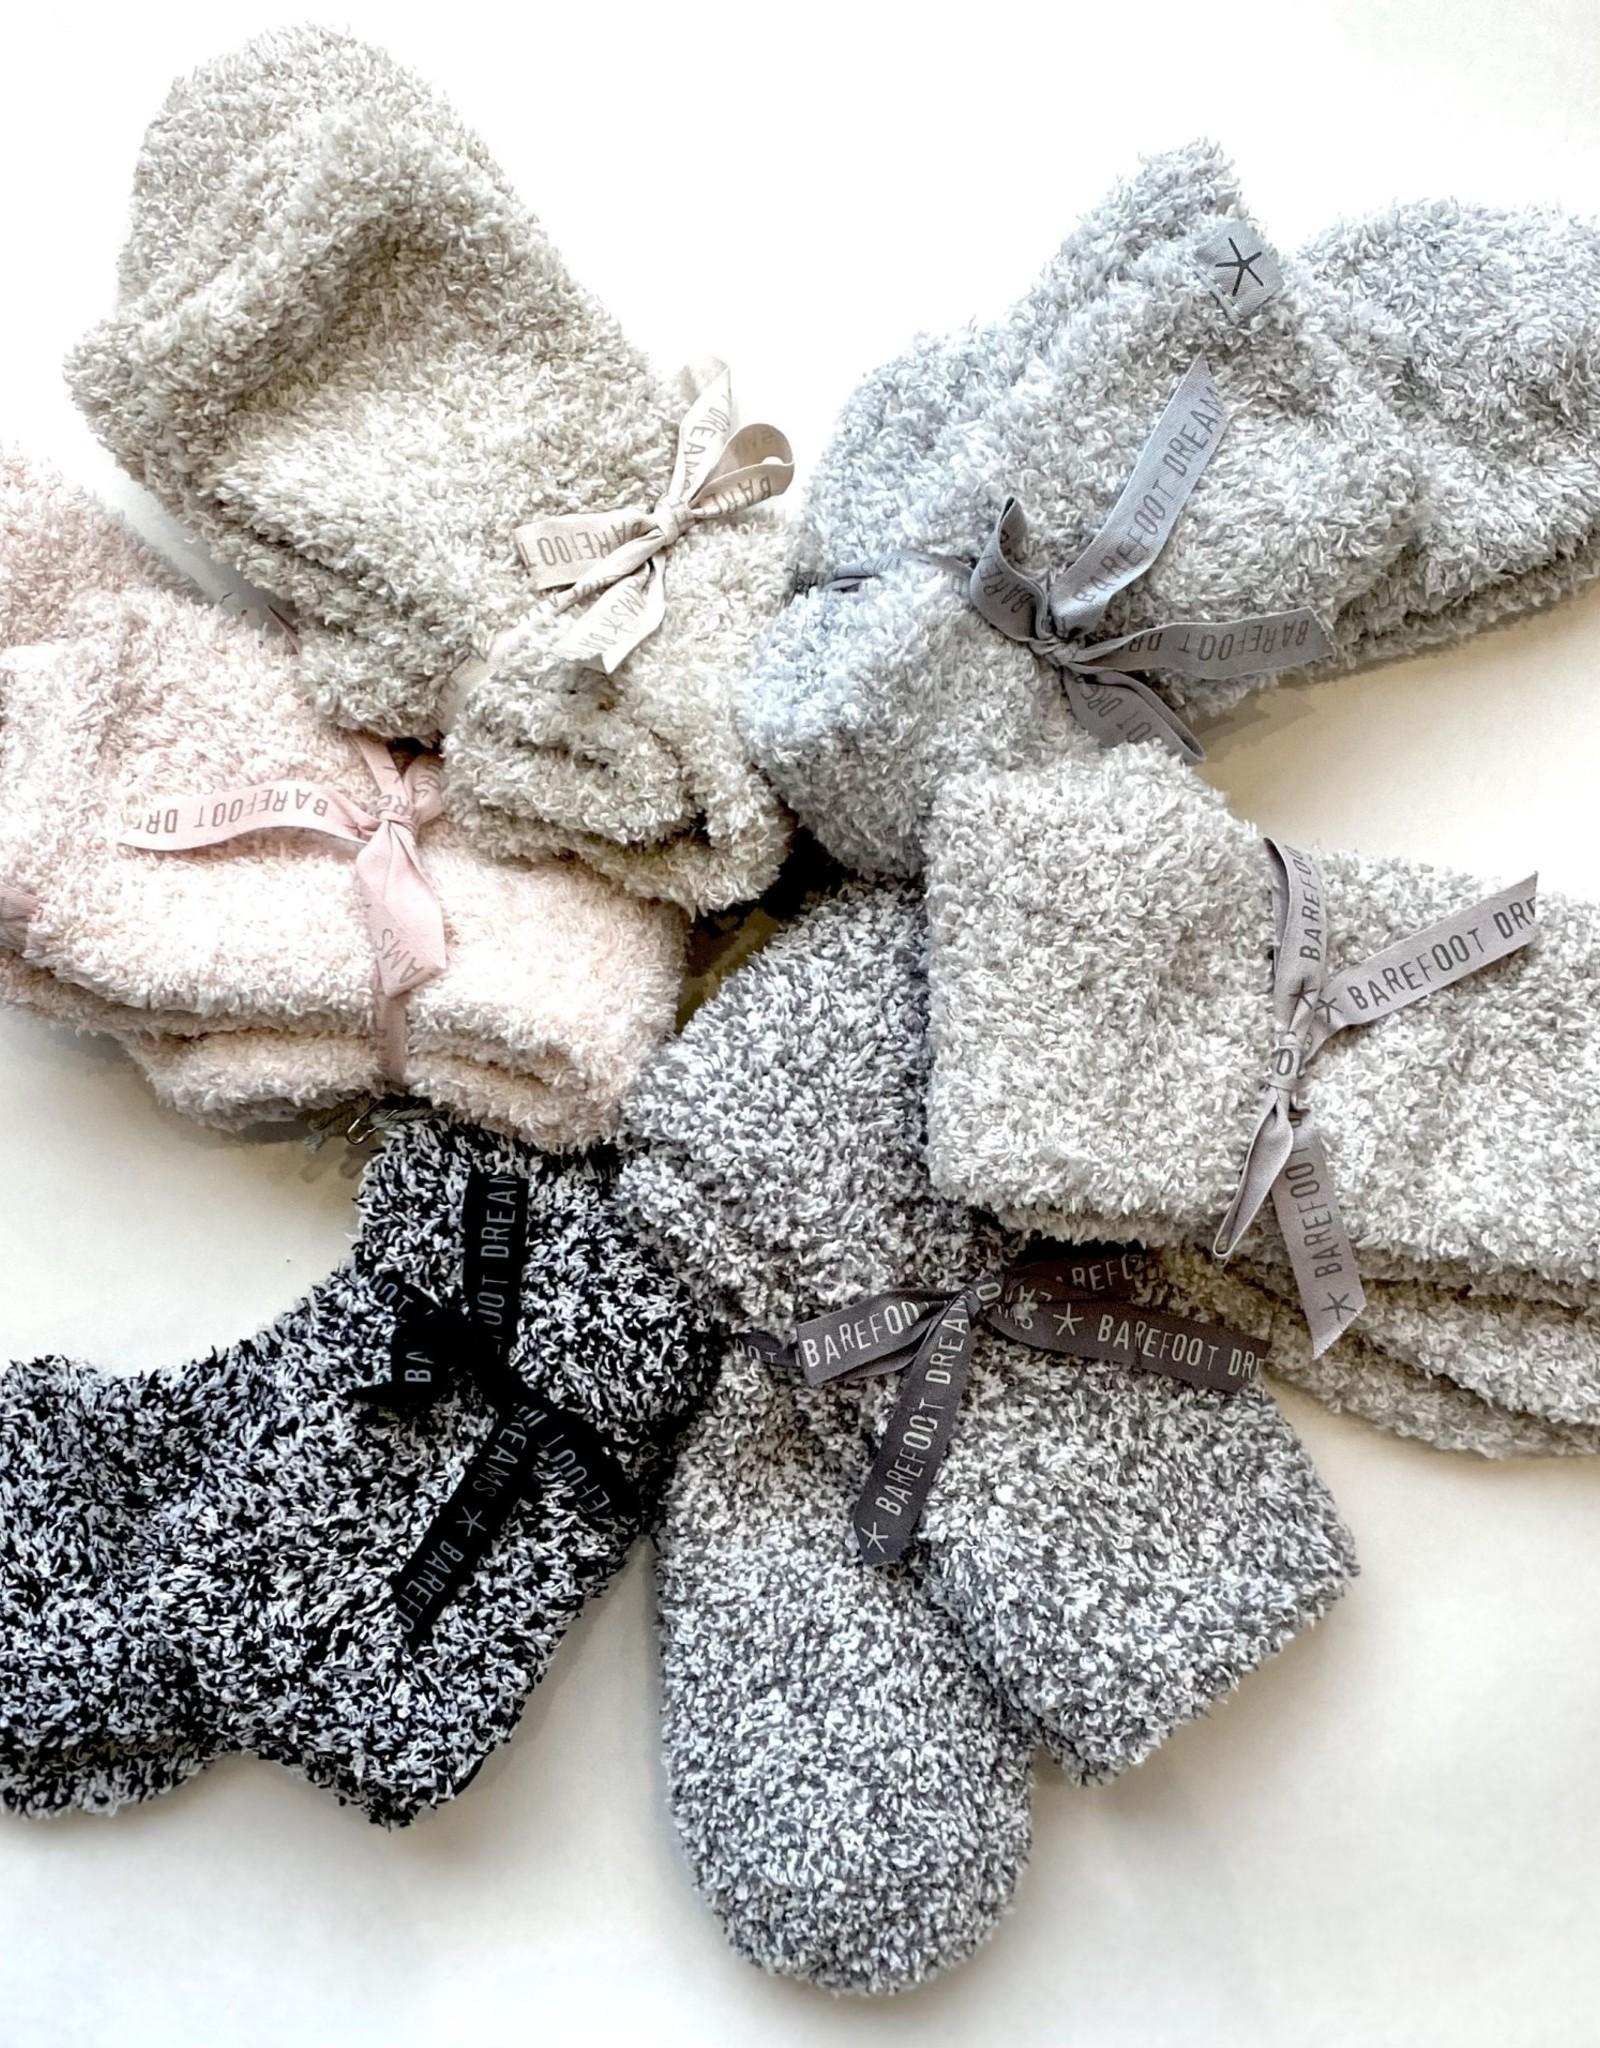 Barefoot Dreams Cozy Chic Women's Socks-Graphite/White